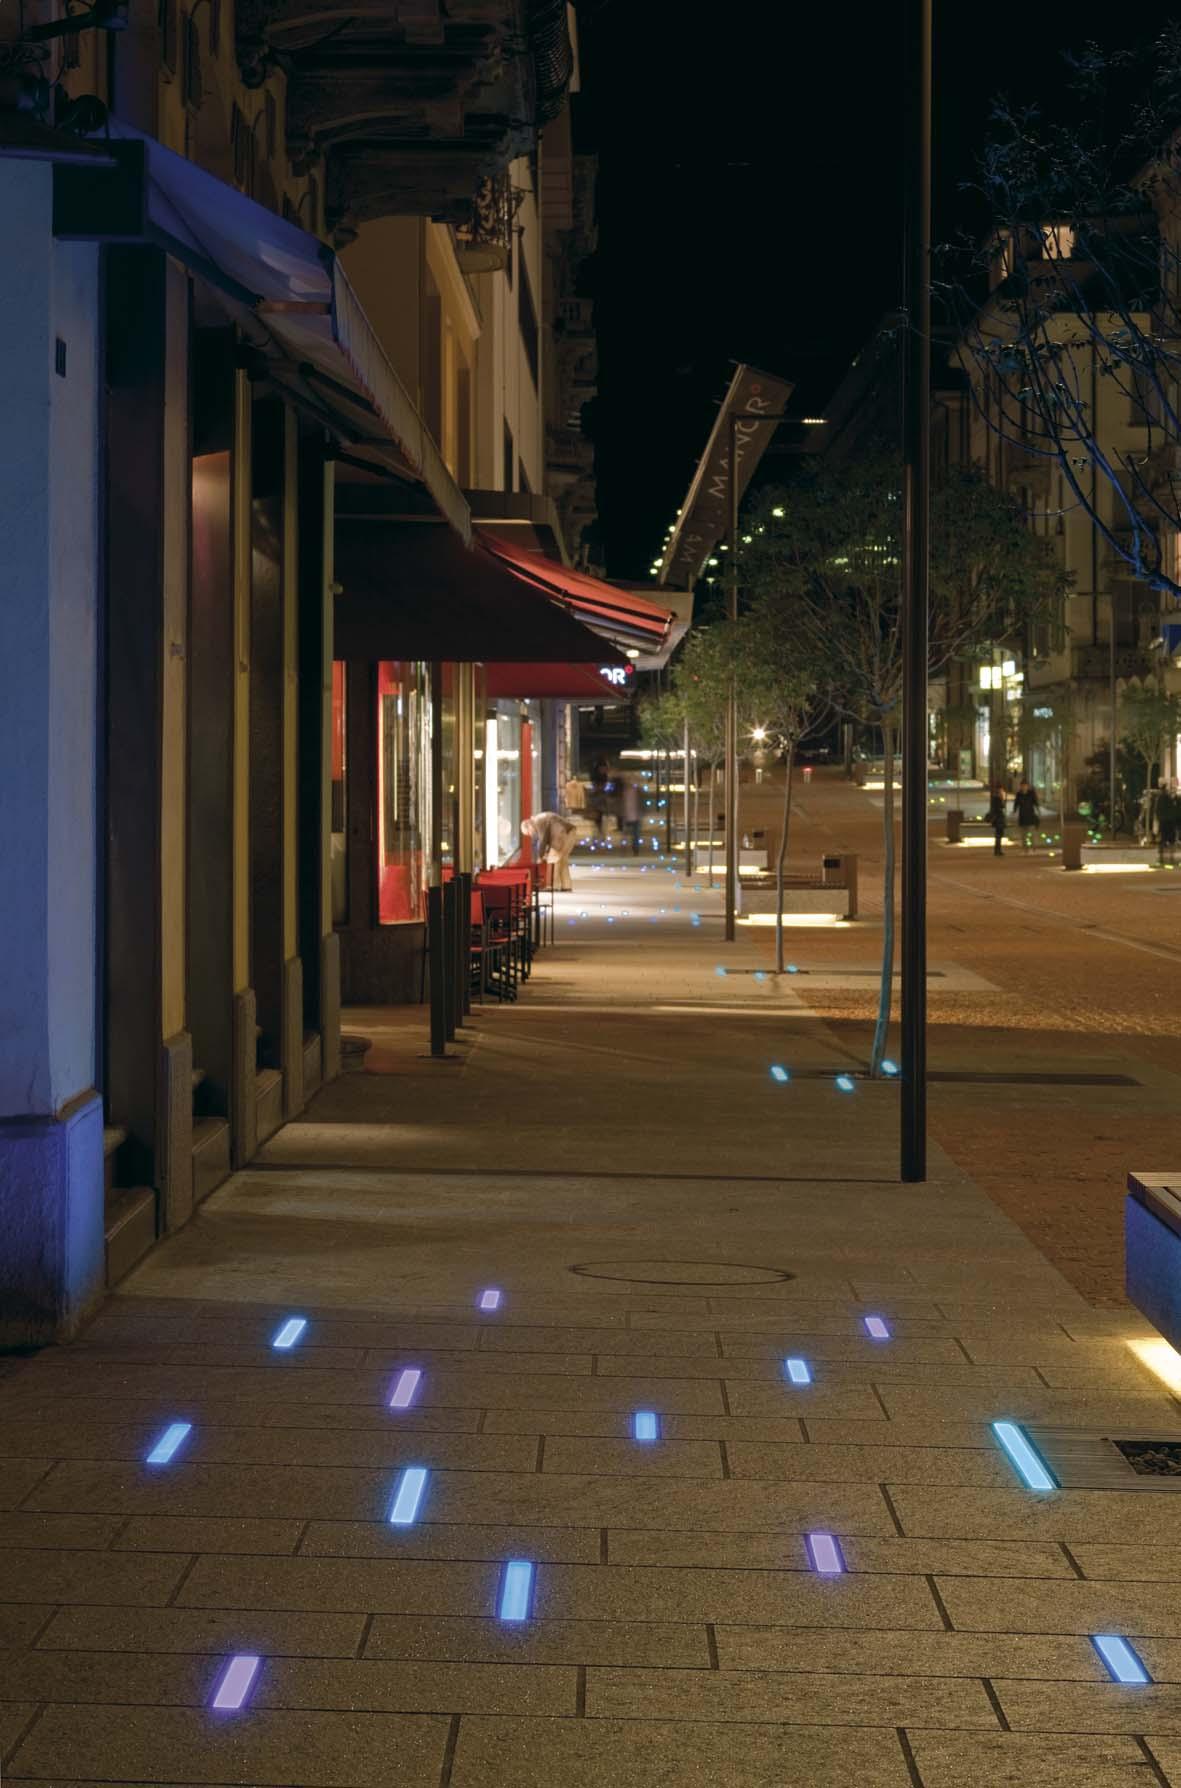 Beleuchtung LED-Lichtdesign Bellinzona Stefano Dall'Osso 10